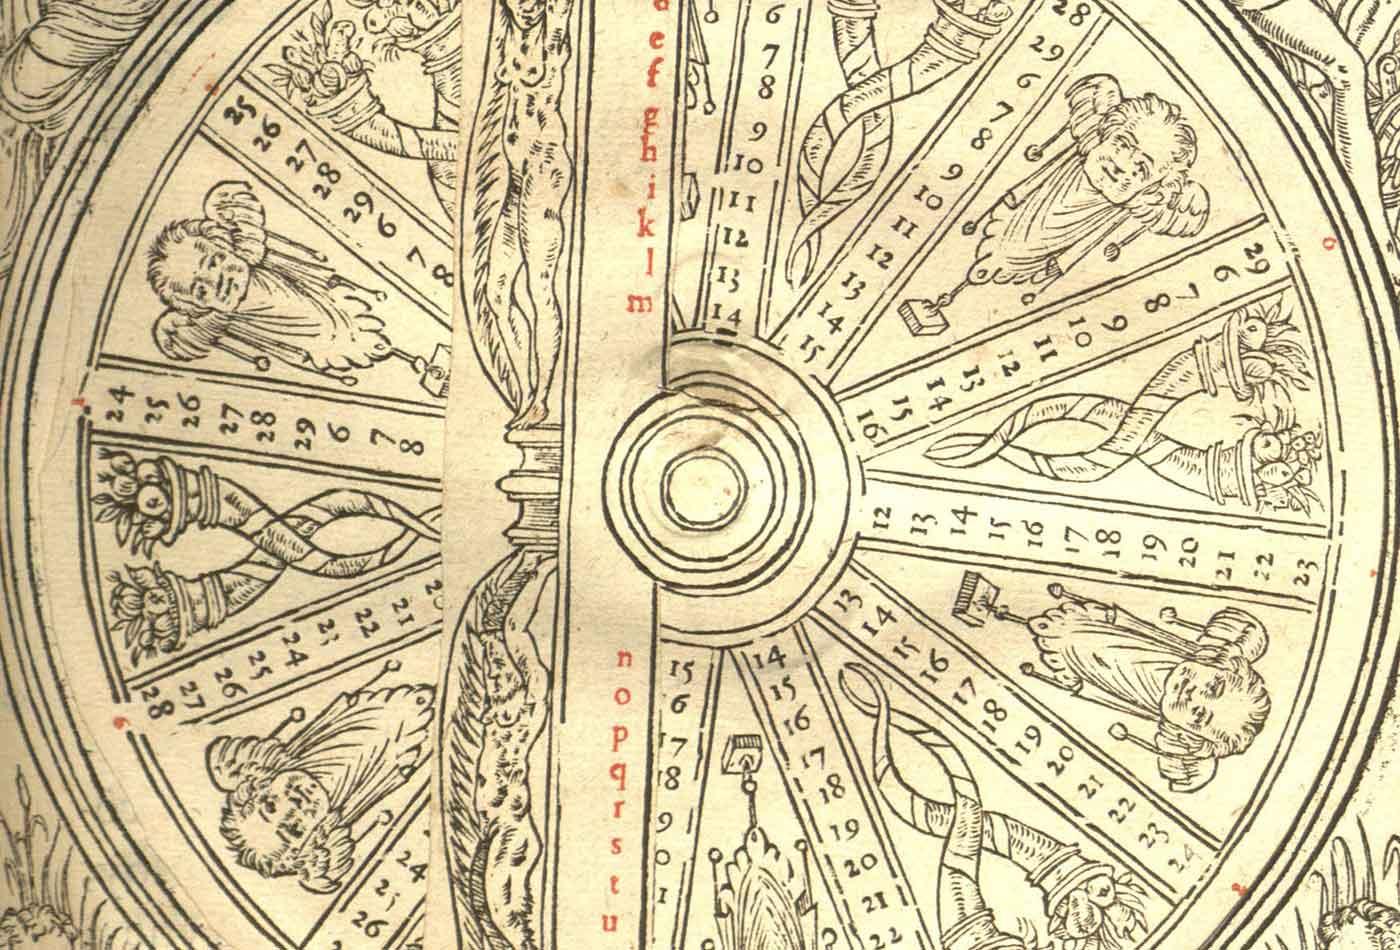 Renaissance cryptography.